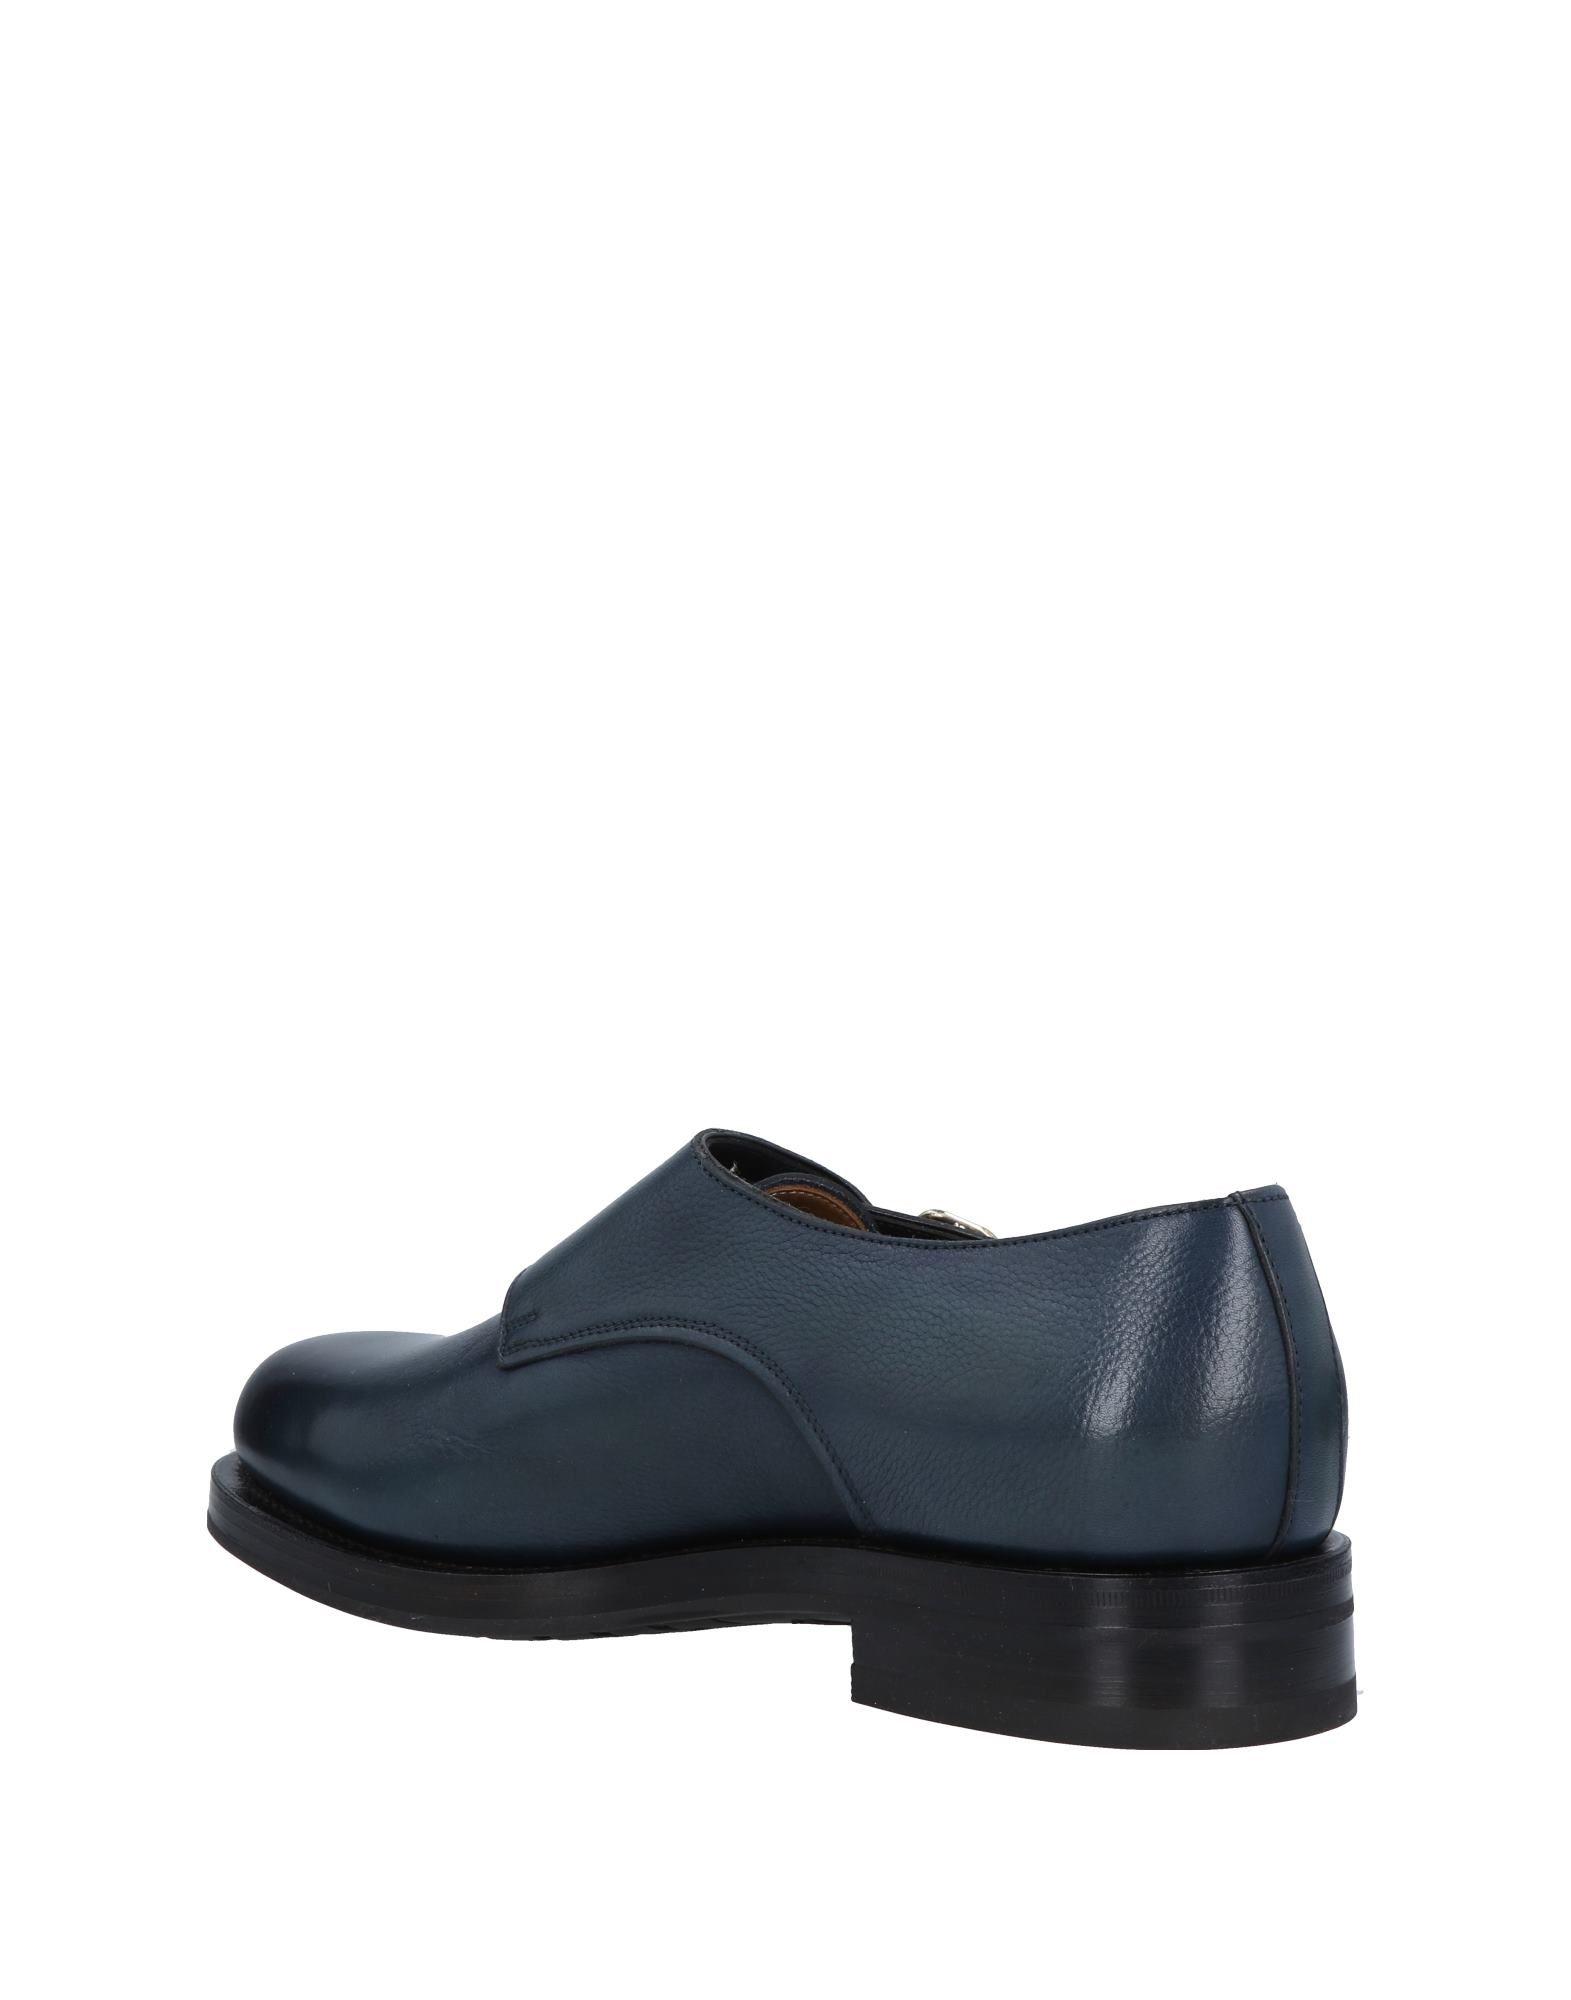 Santoni Mokassins Herren beliebte  11478986LS Gute Qualität beliebte Herren Schuhe c3e6be